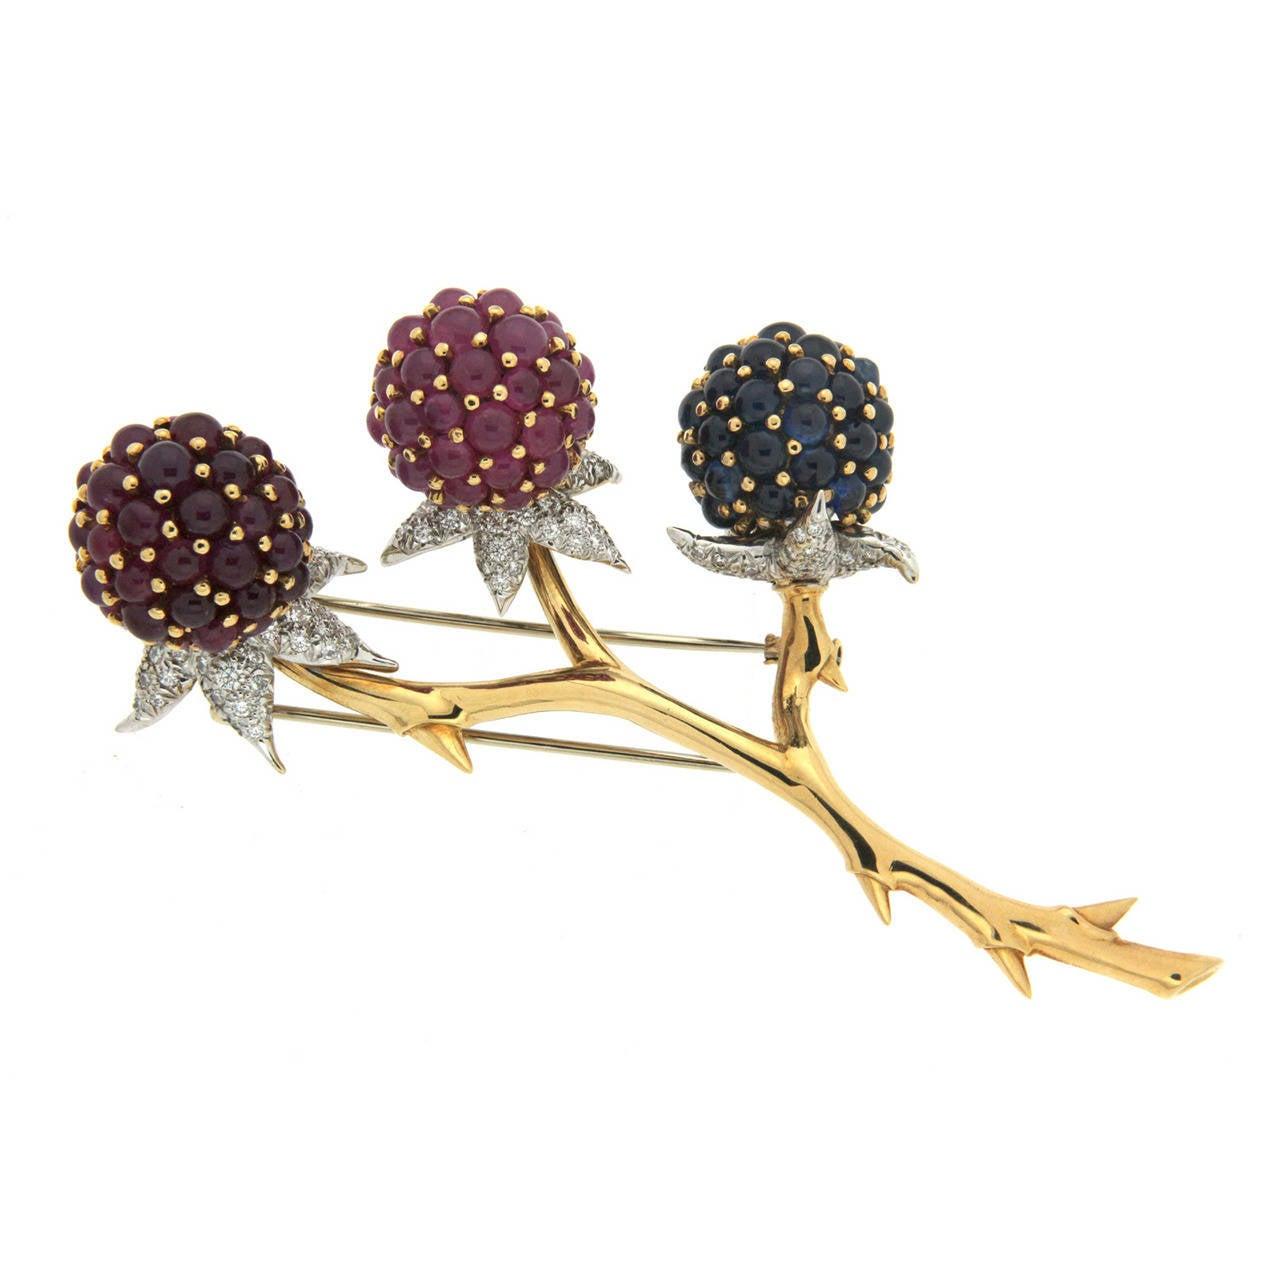 Tutti Frutti Sapphire Ruby Gold Brooch